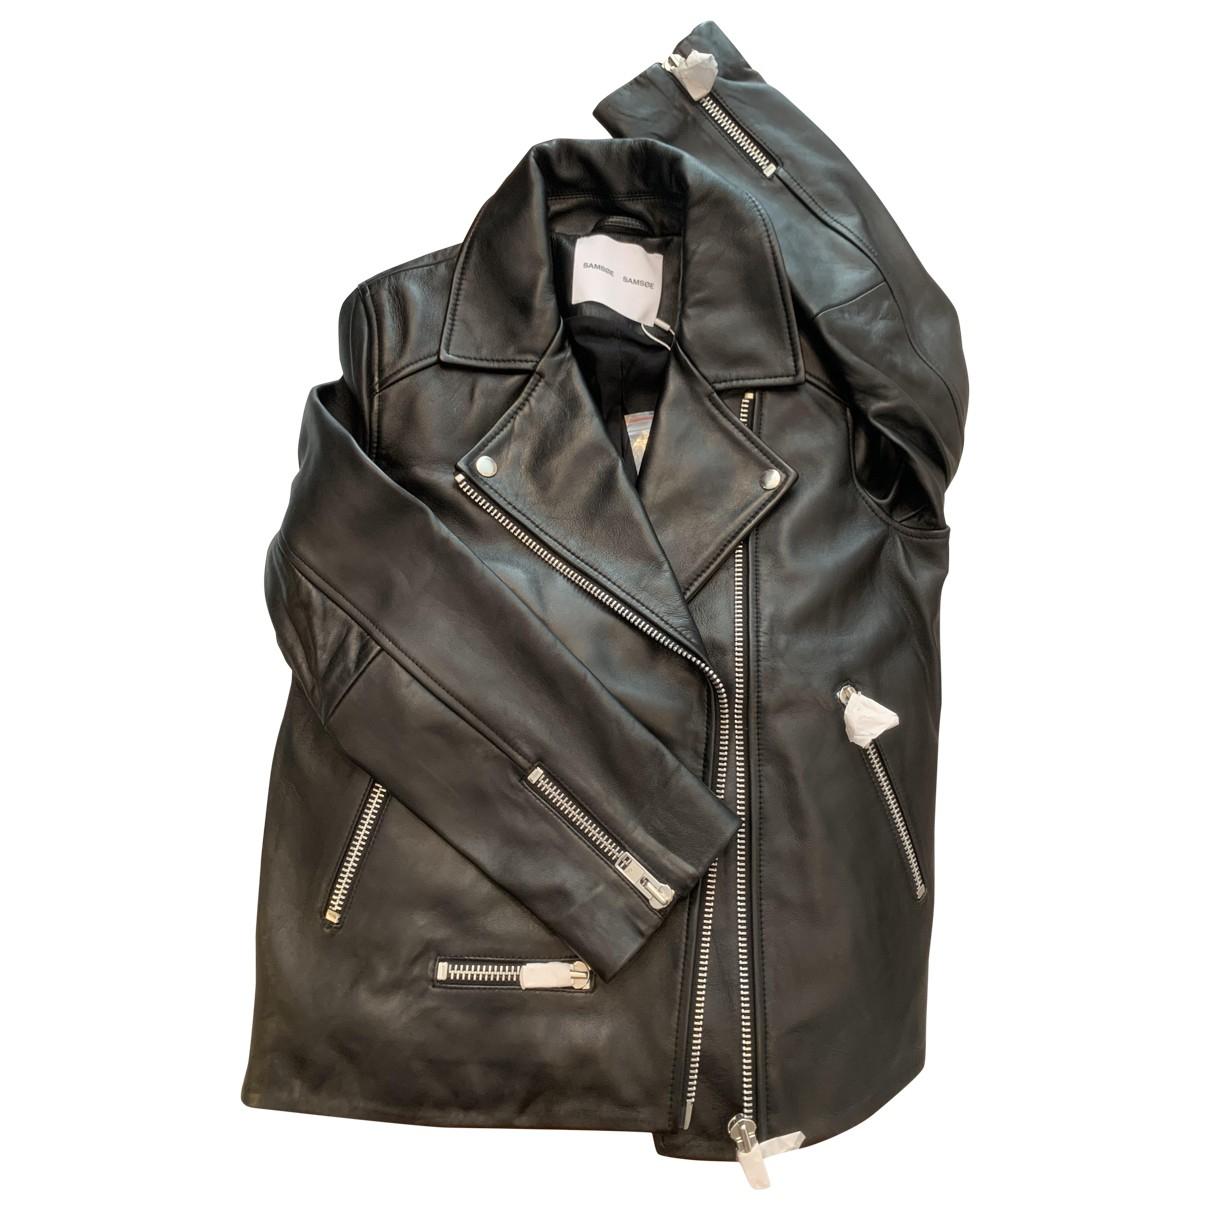 Samsoe & Samsoe \N Black Leather jacket for Women S International